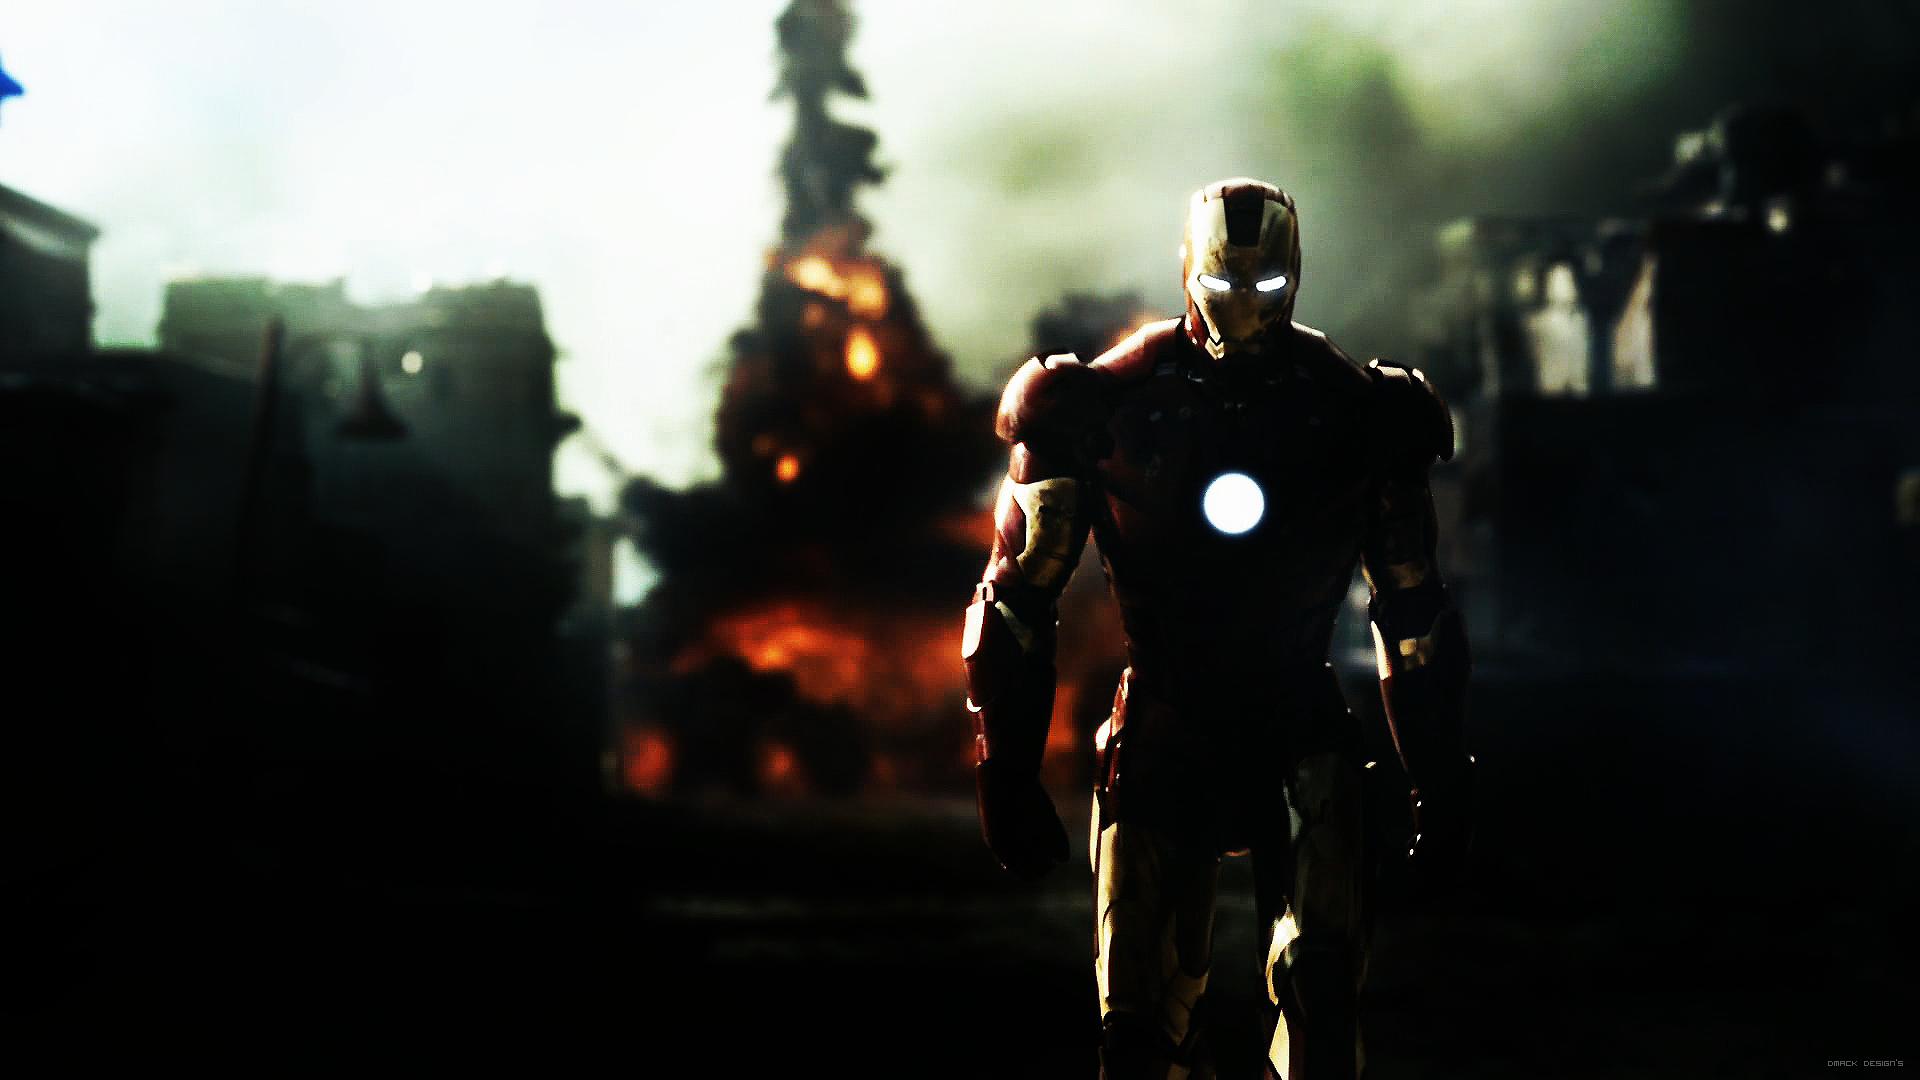 Megapost Wallpapers HD de Iron Man [Uno te llevas]   Taringa 1920x1080